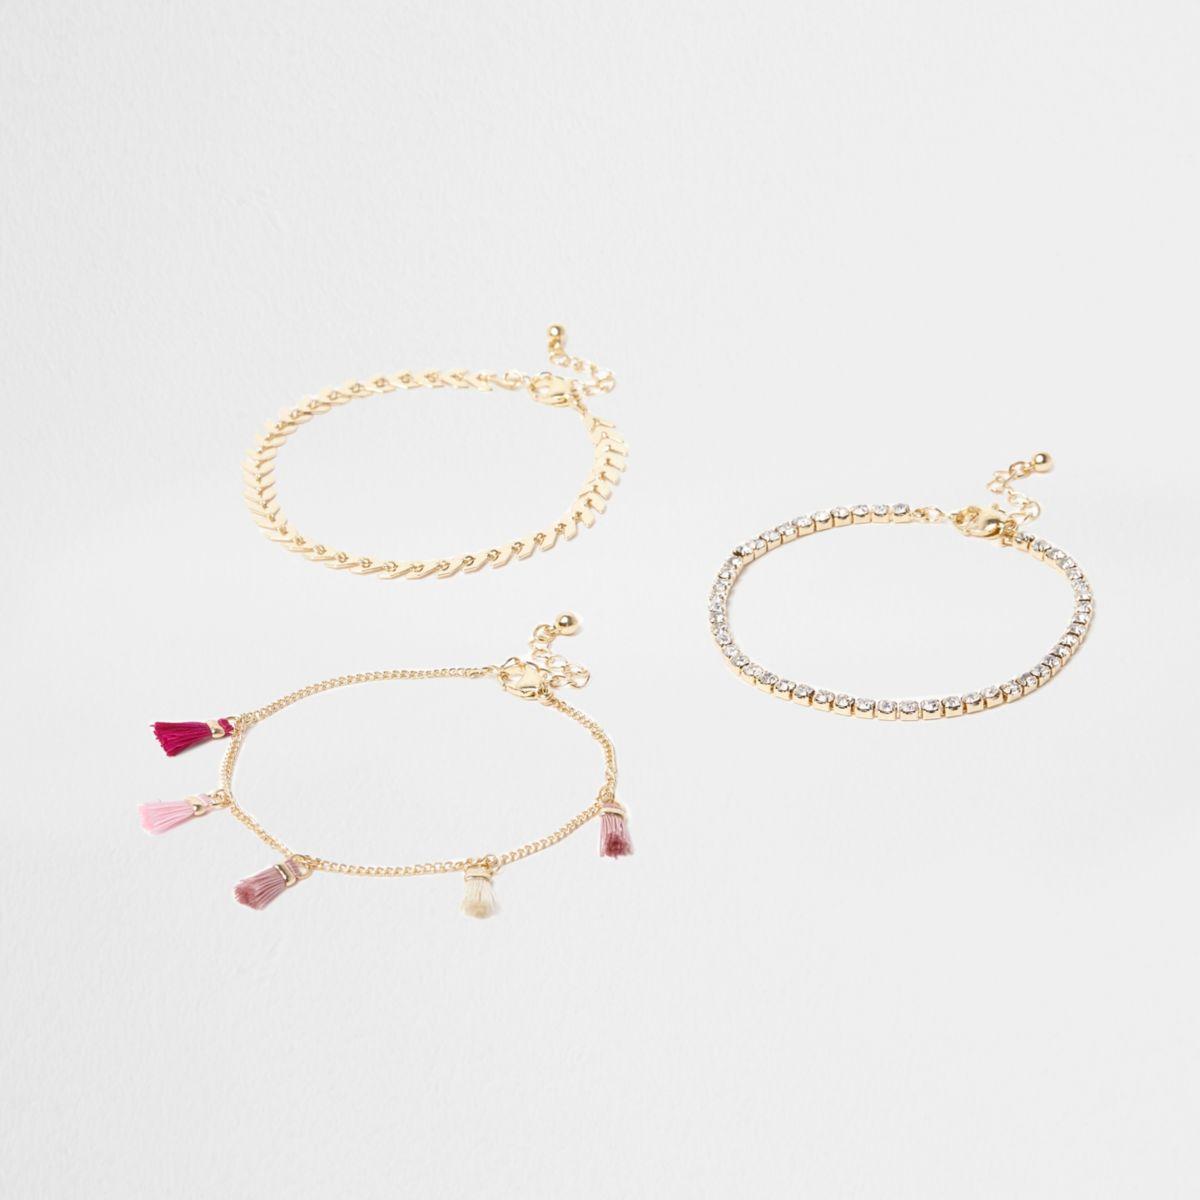 Pink tassel and rhinestone anklet multipack